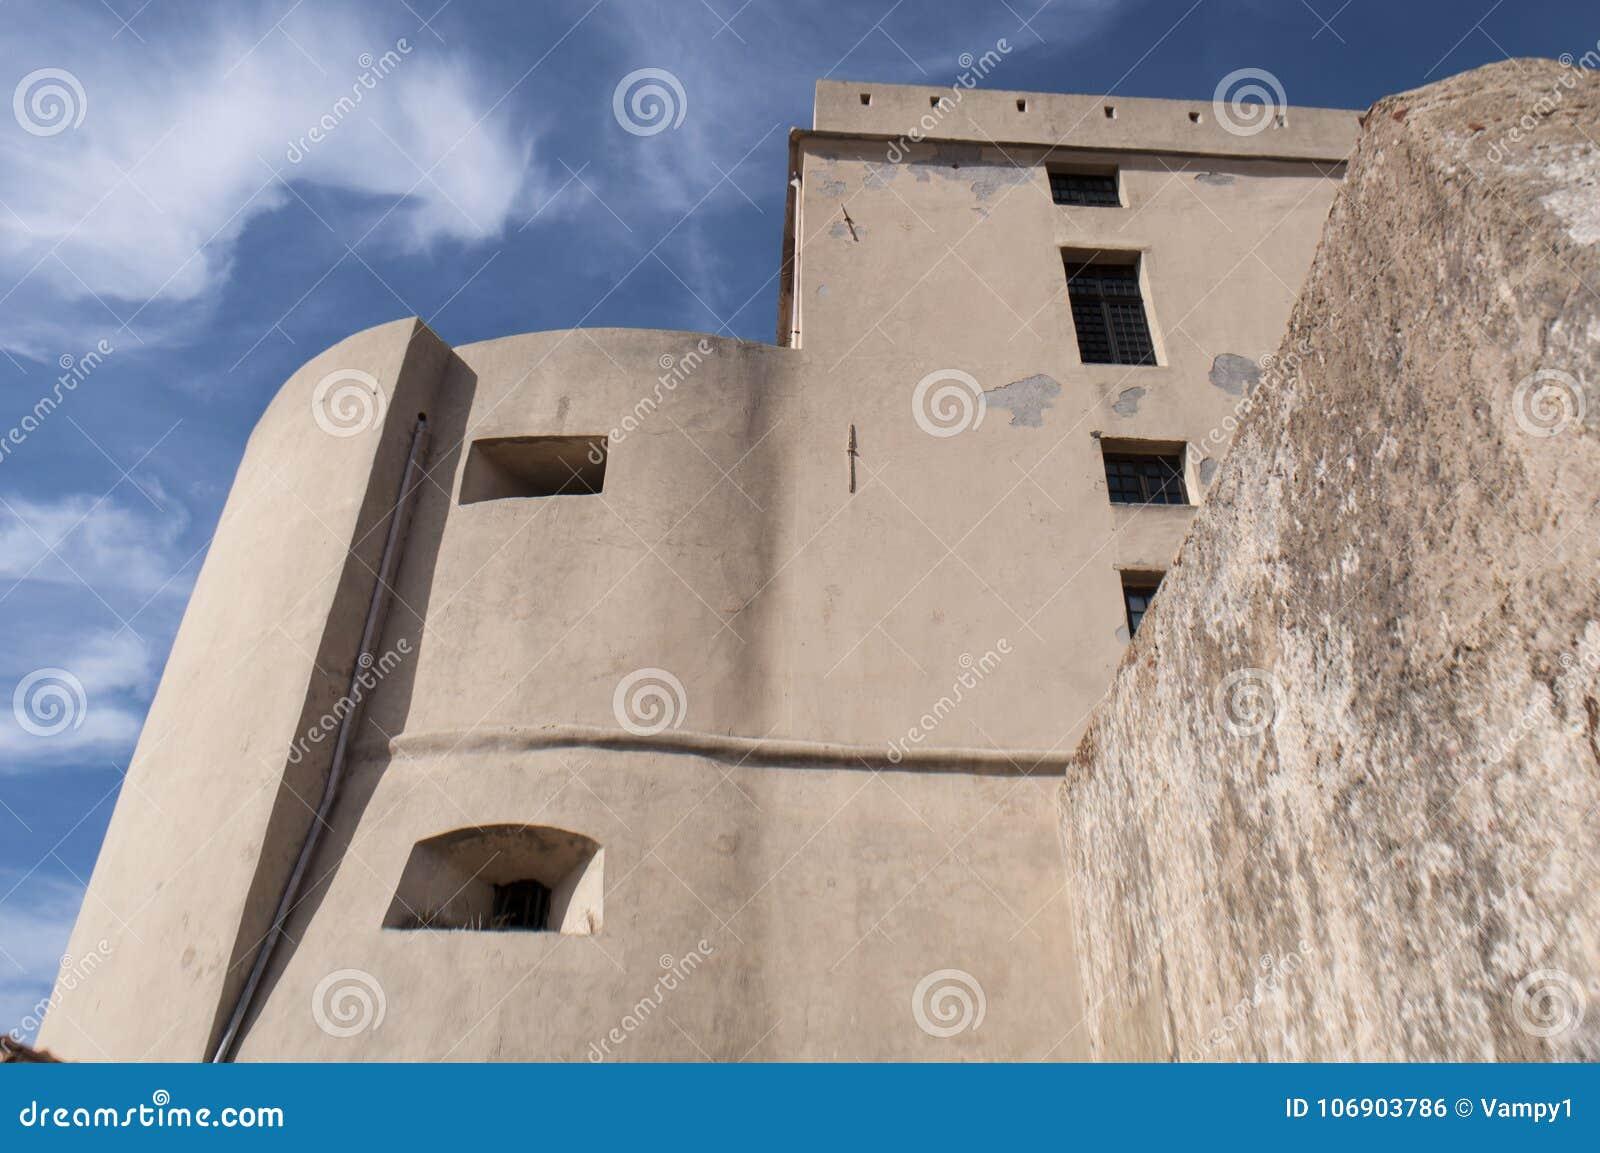 Calvi, cytadela, antyczne ściany, linia horyzontu, Corsica, Corse, Francja, Europa, islandi